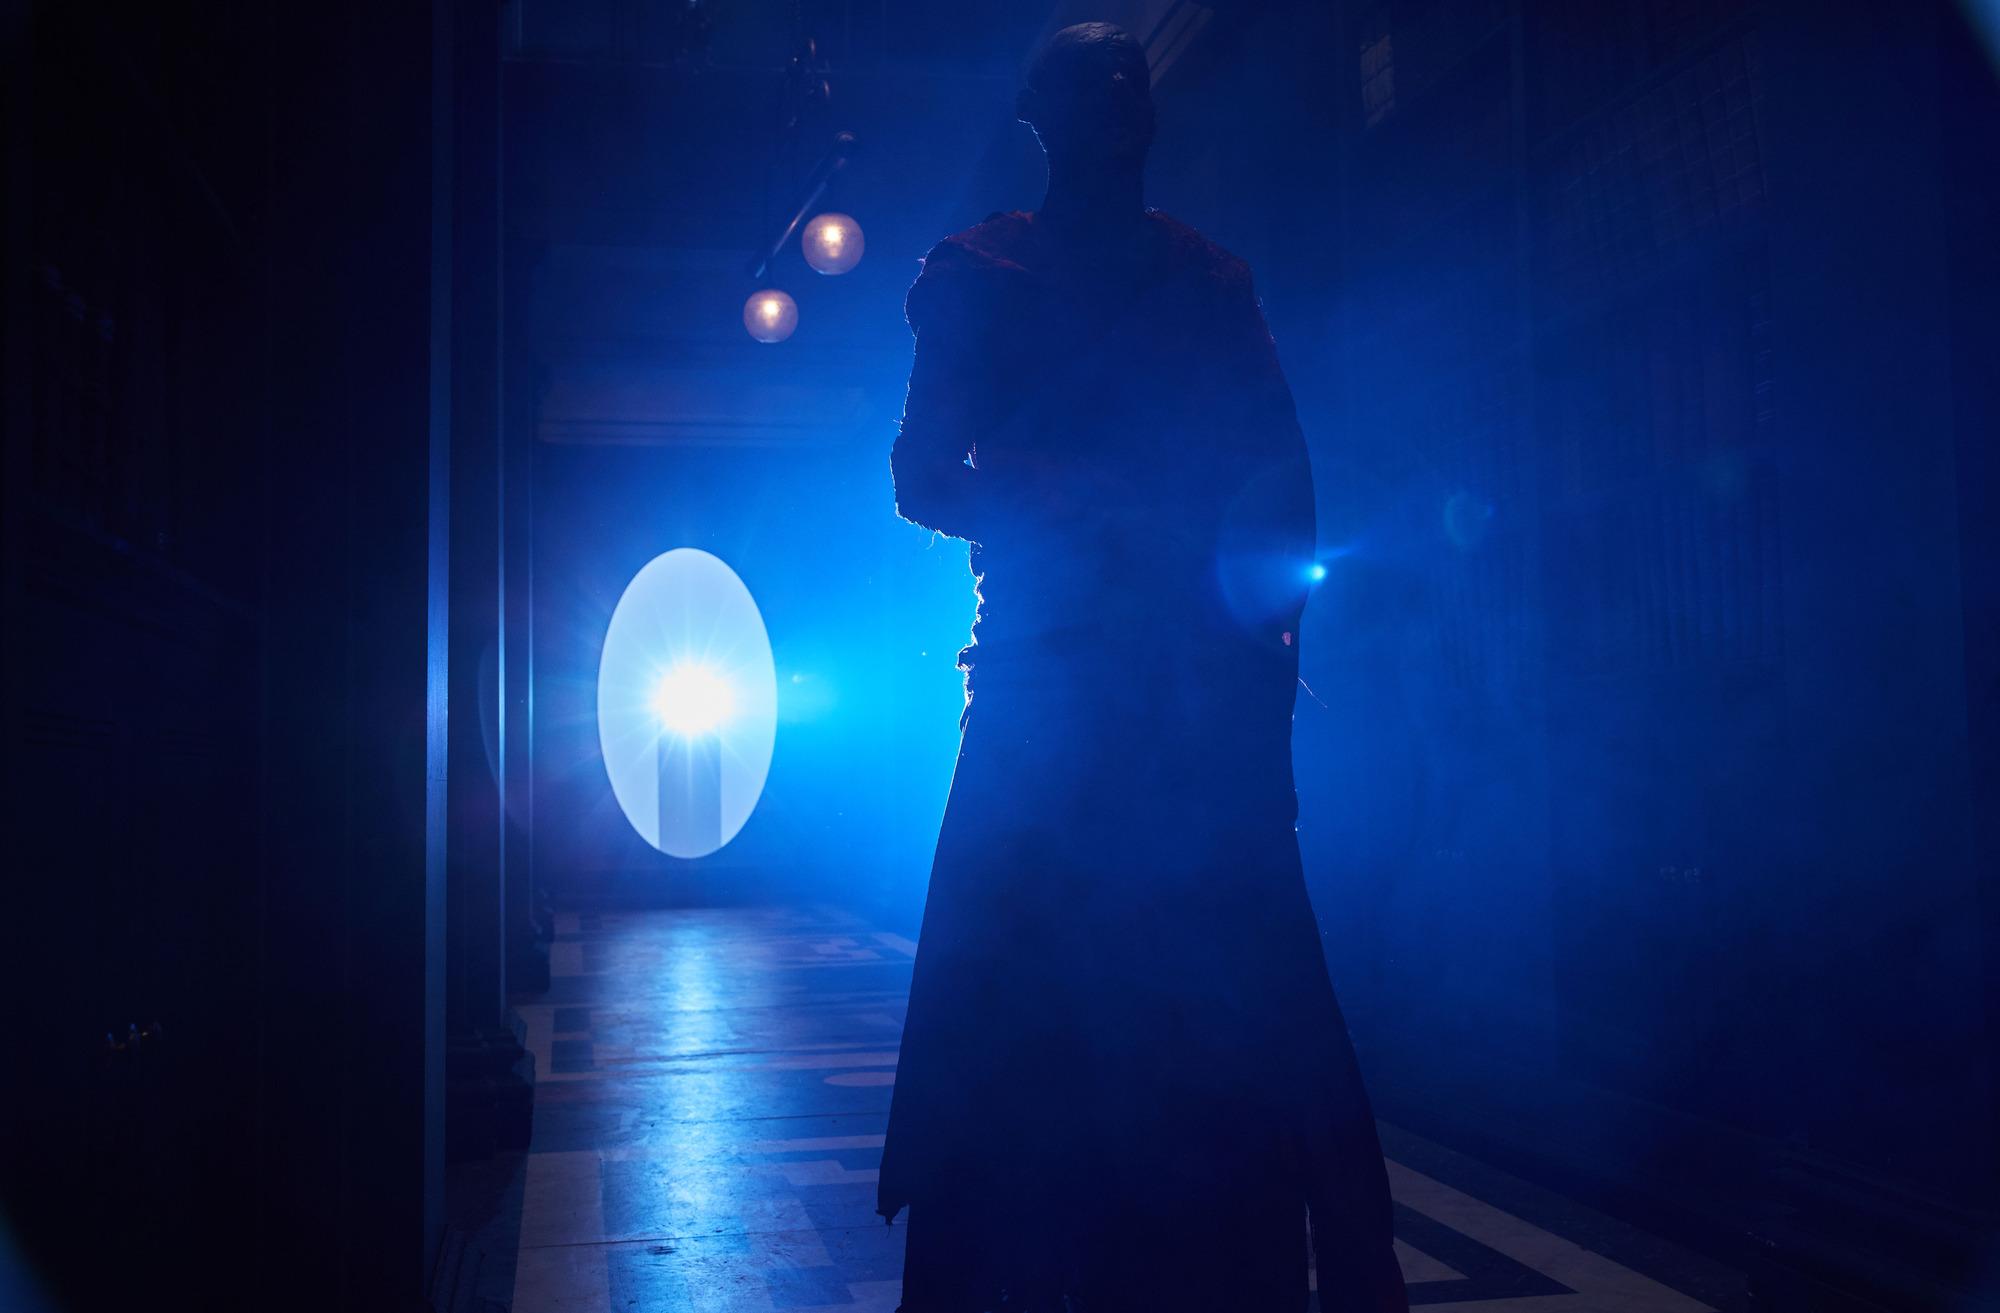 Extremis: Monk (Credit: BBC/BBC Worldwide (Simon Ridgway))